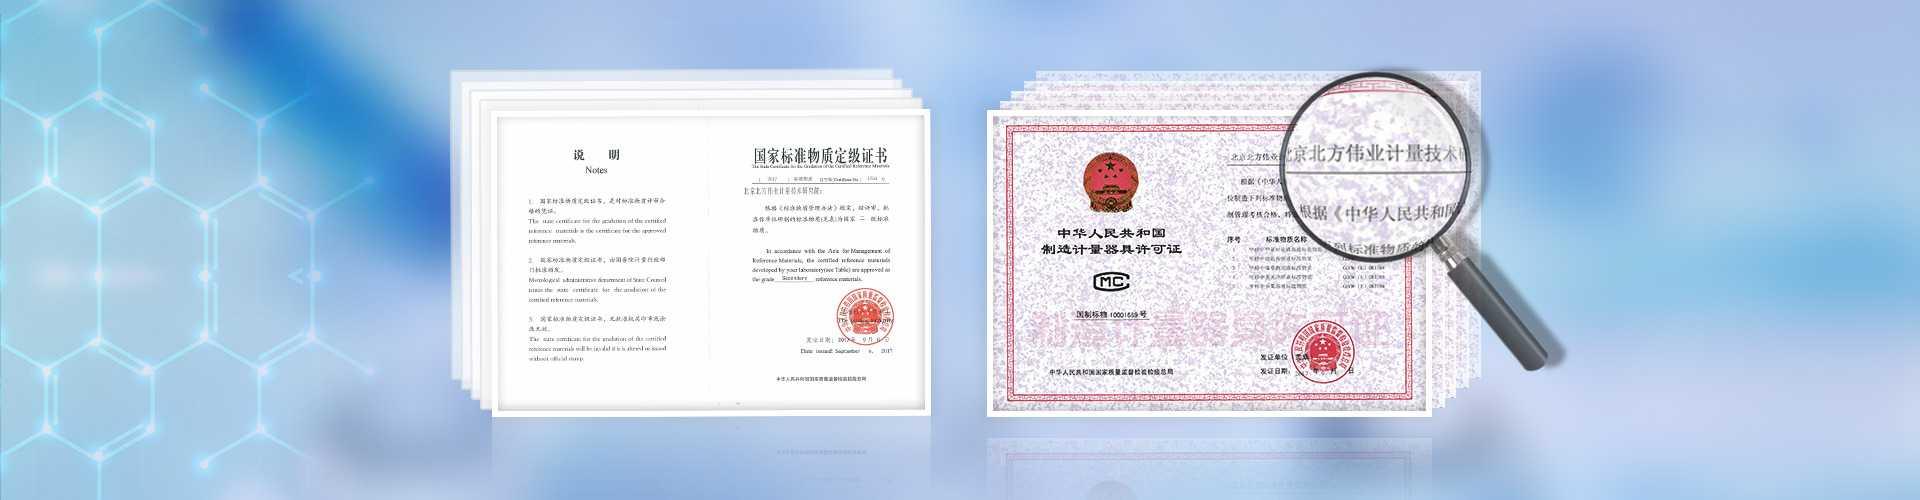 资质证书-www.xbpjs.tw国家标准物质网